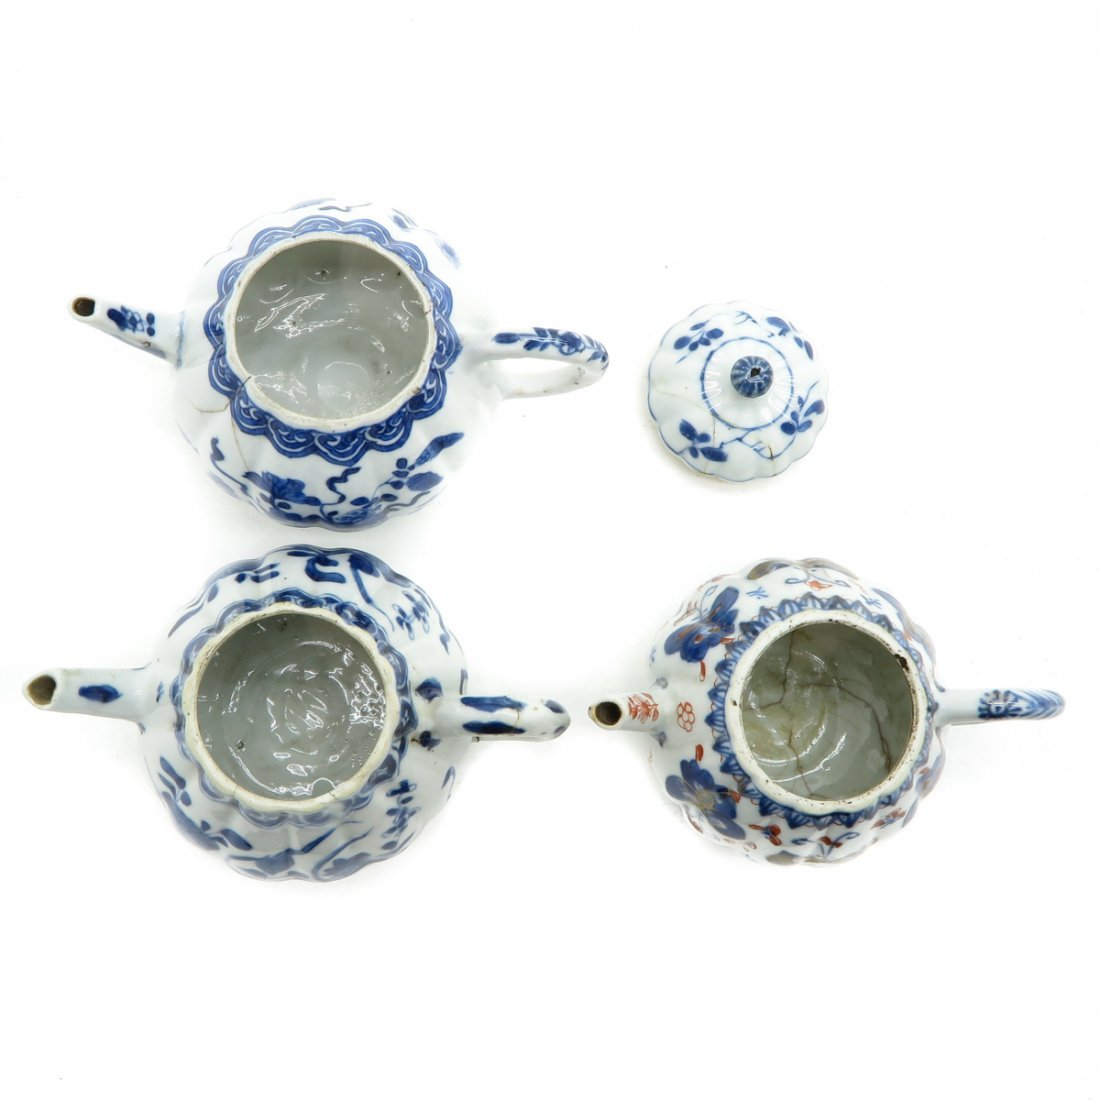 Lot of 3 Teapots - 5